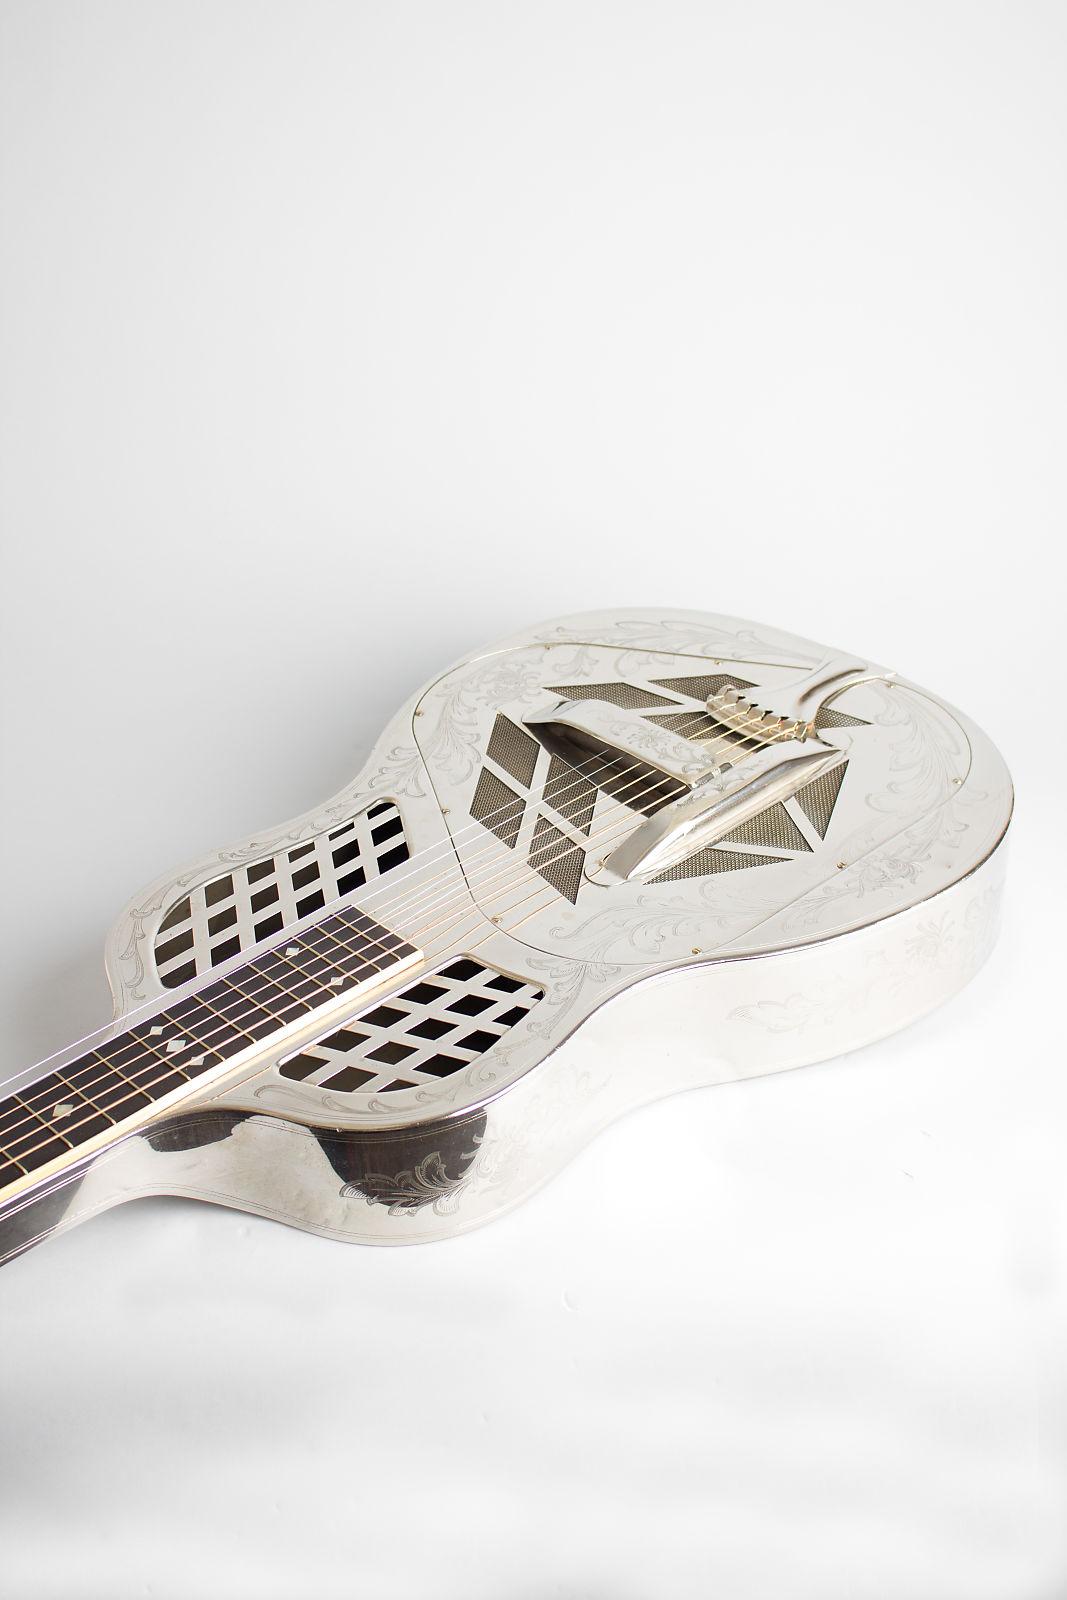 National  Style 4 Tricone Squareneck Resophonic Guitar (1929), ser. #1648, original black hard shell case.